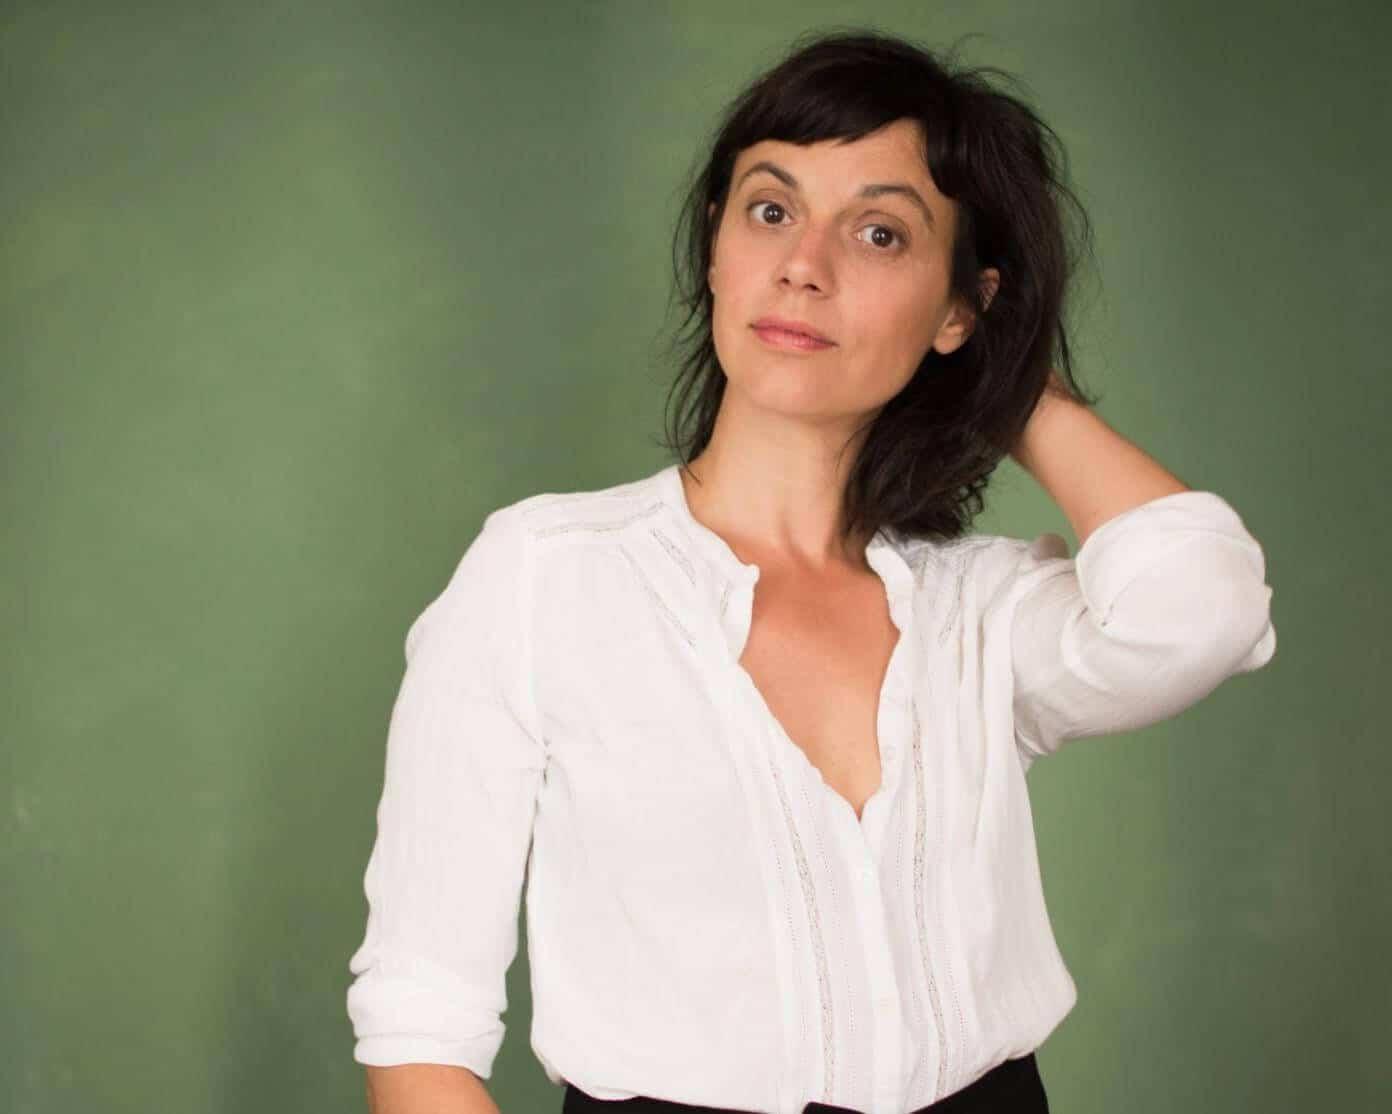 Céline Milliat Baumgartner